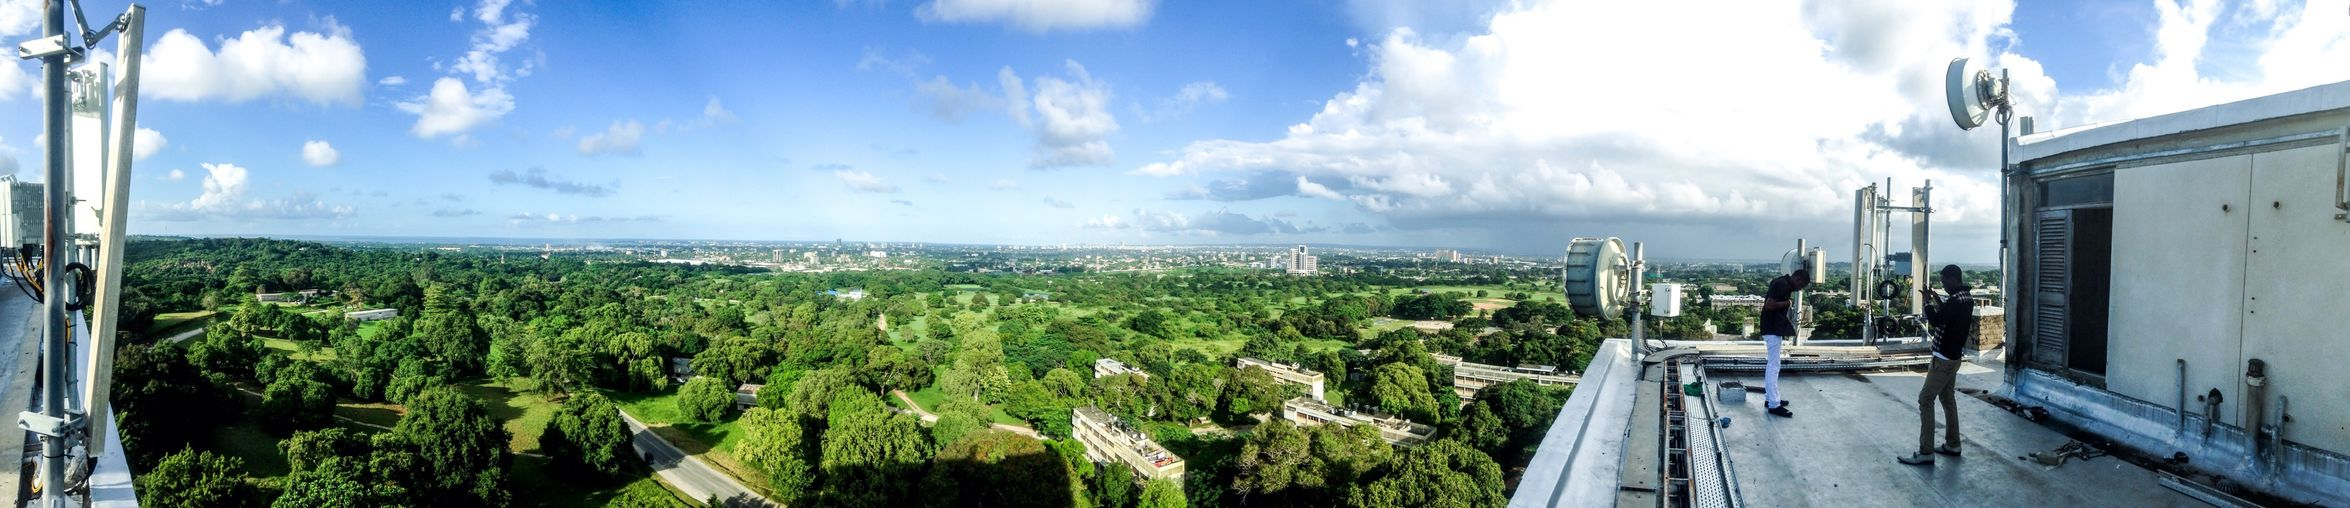 Noon panorama Noonpano Panorama Panoramic Photography Tanzania